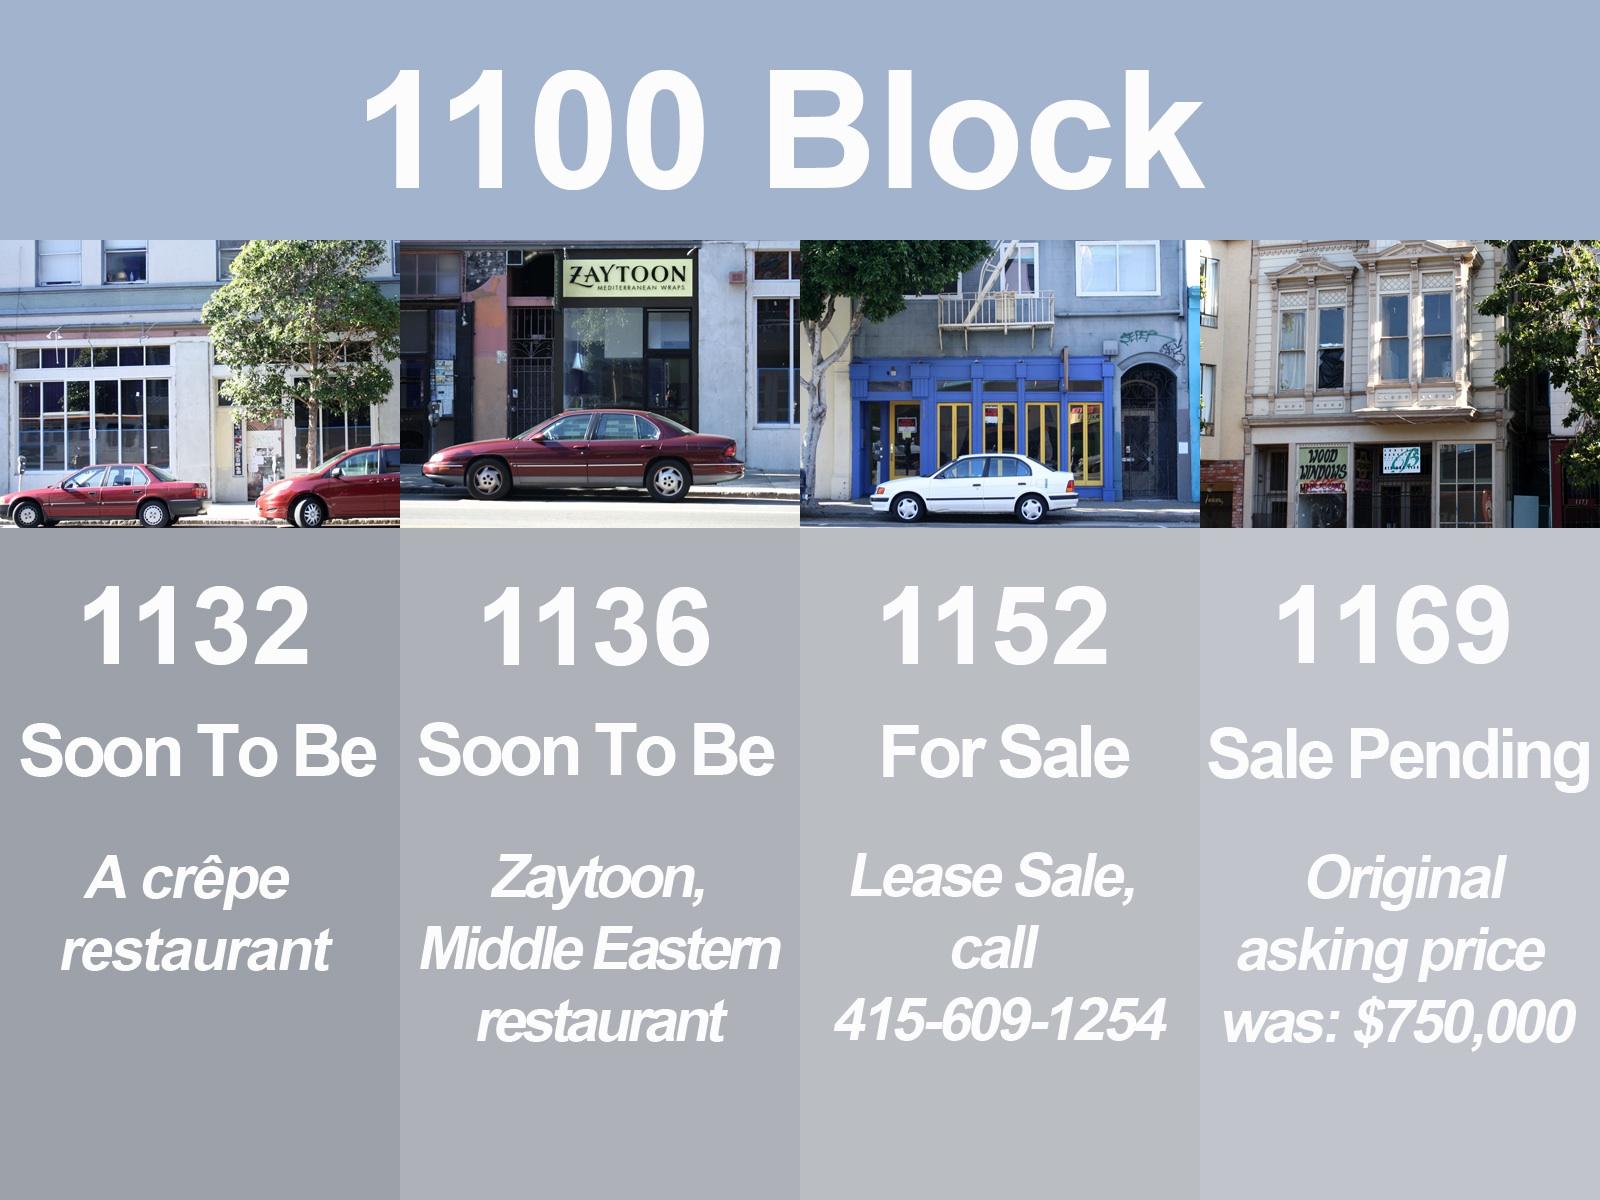 1100 Block